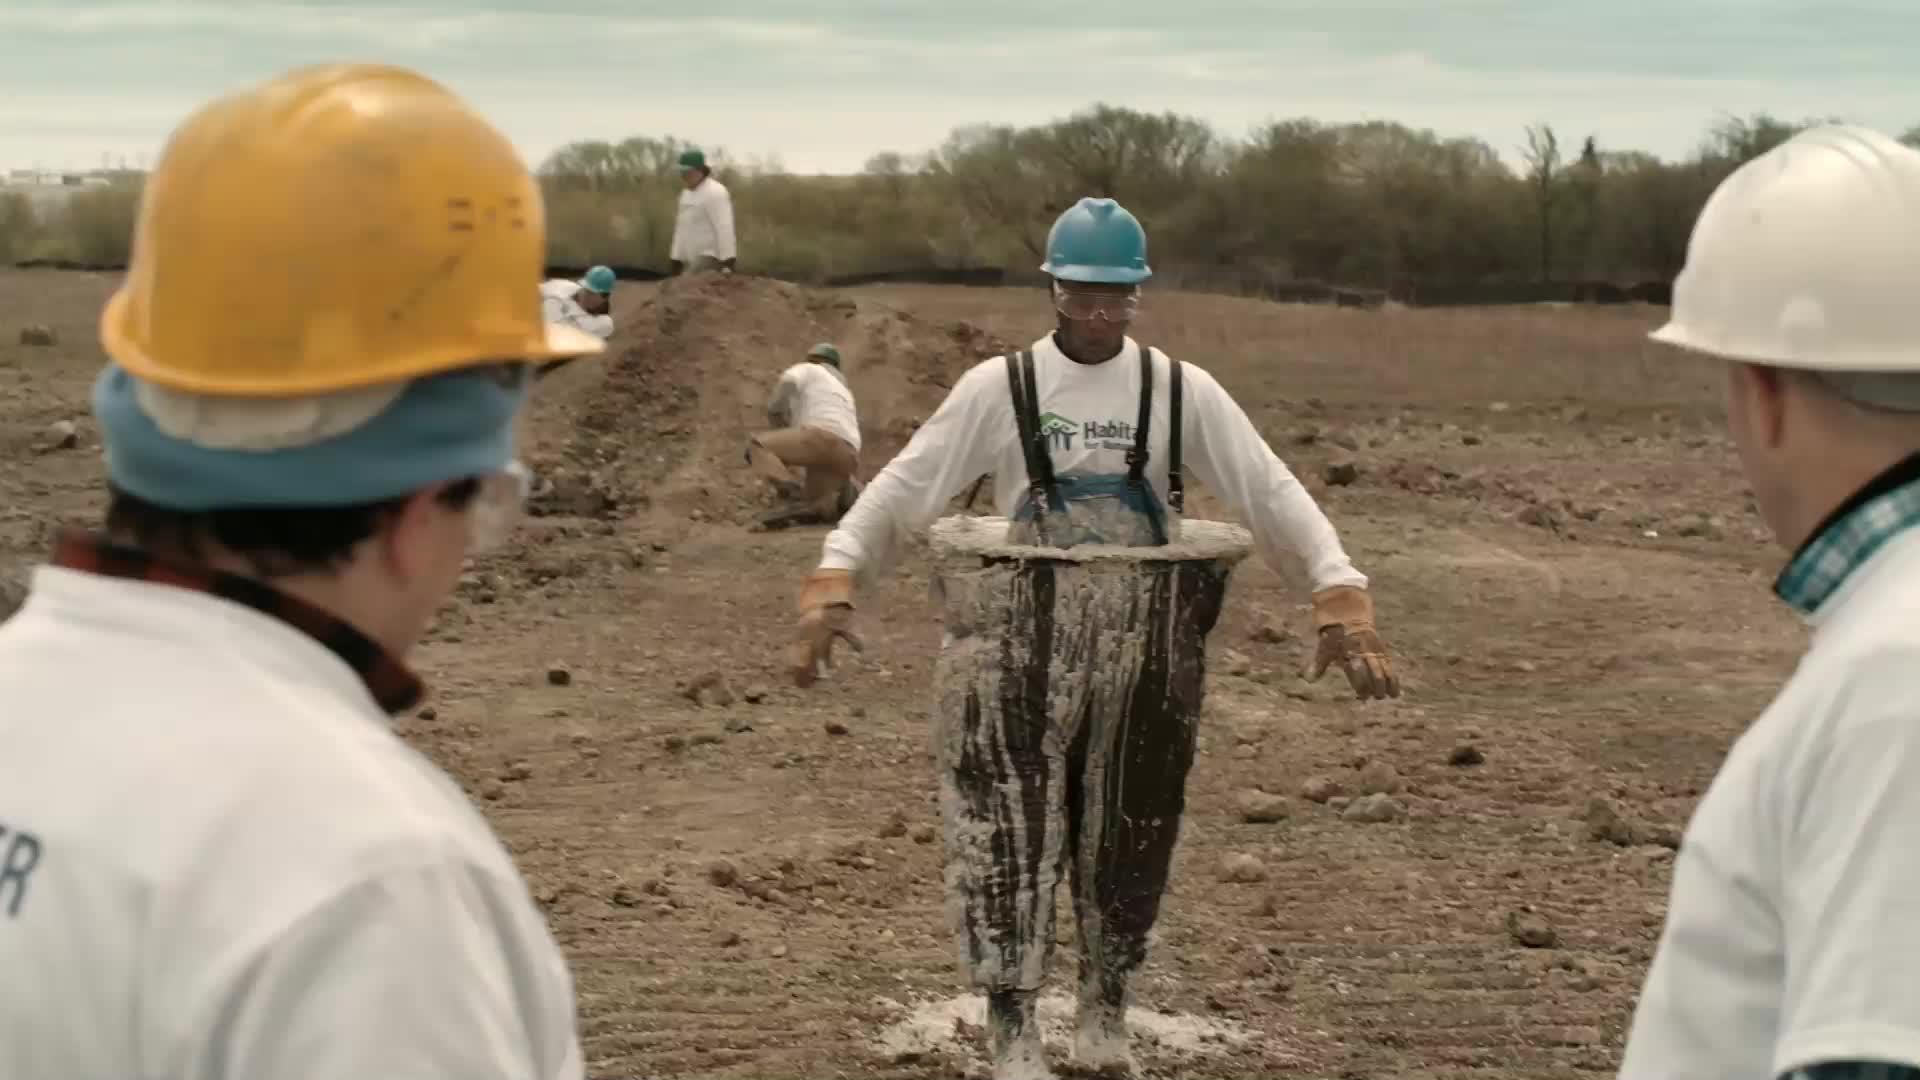 Honoree - Volunteers Alone: Man Mixer/Man Barrow/Man Brace